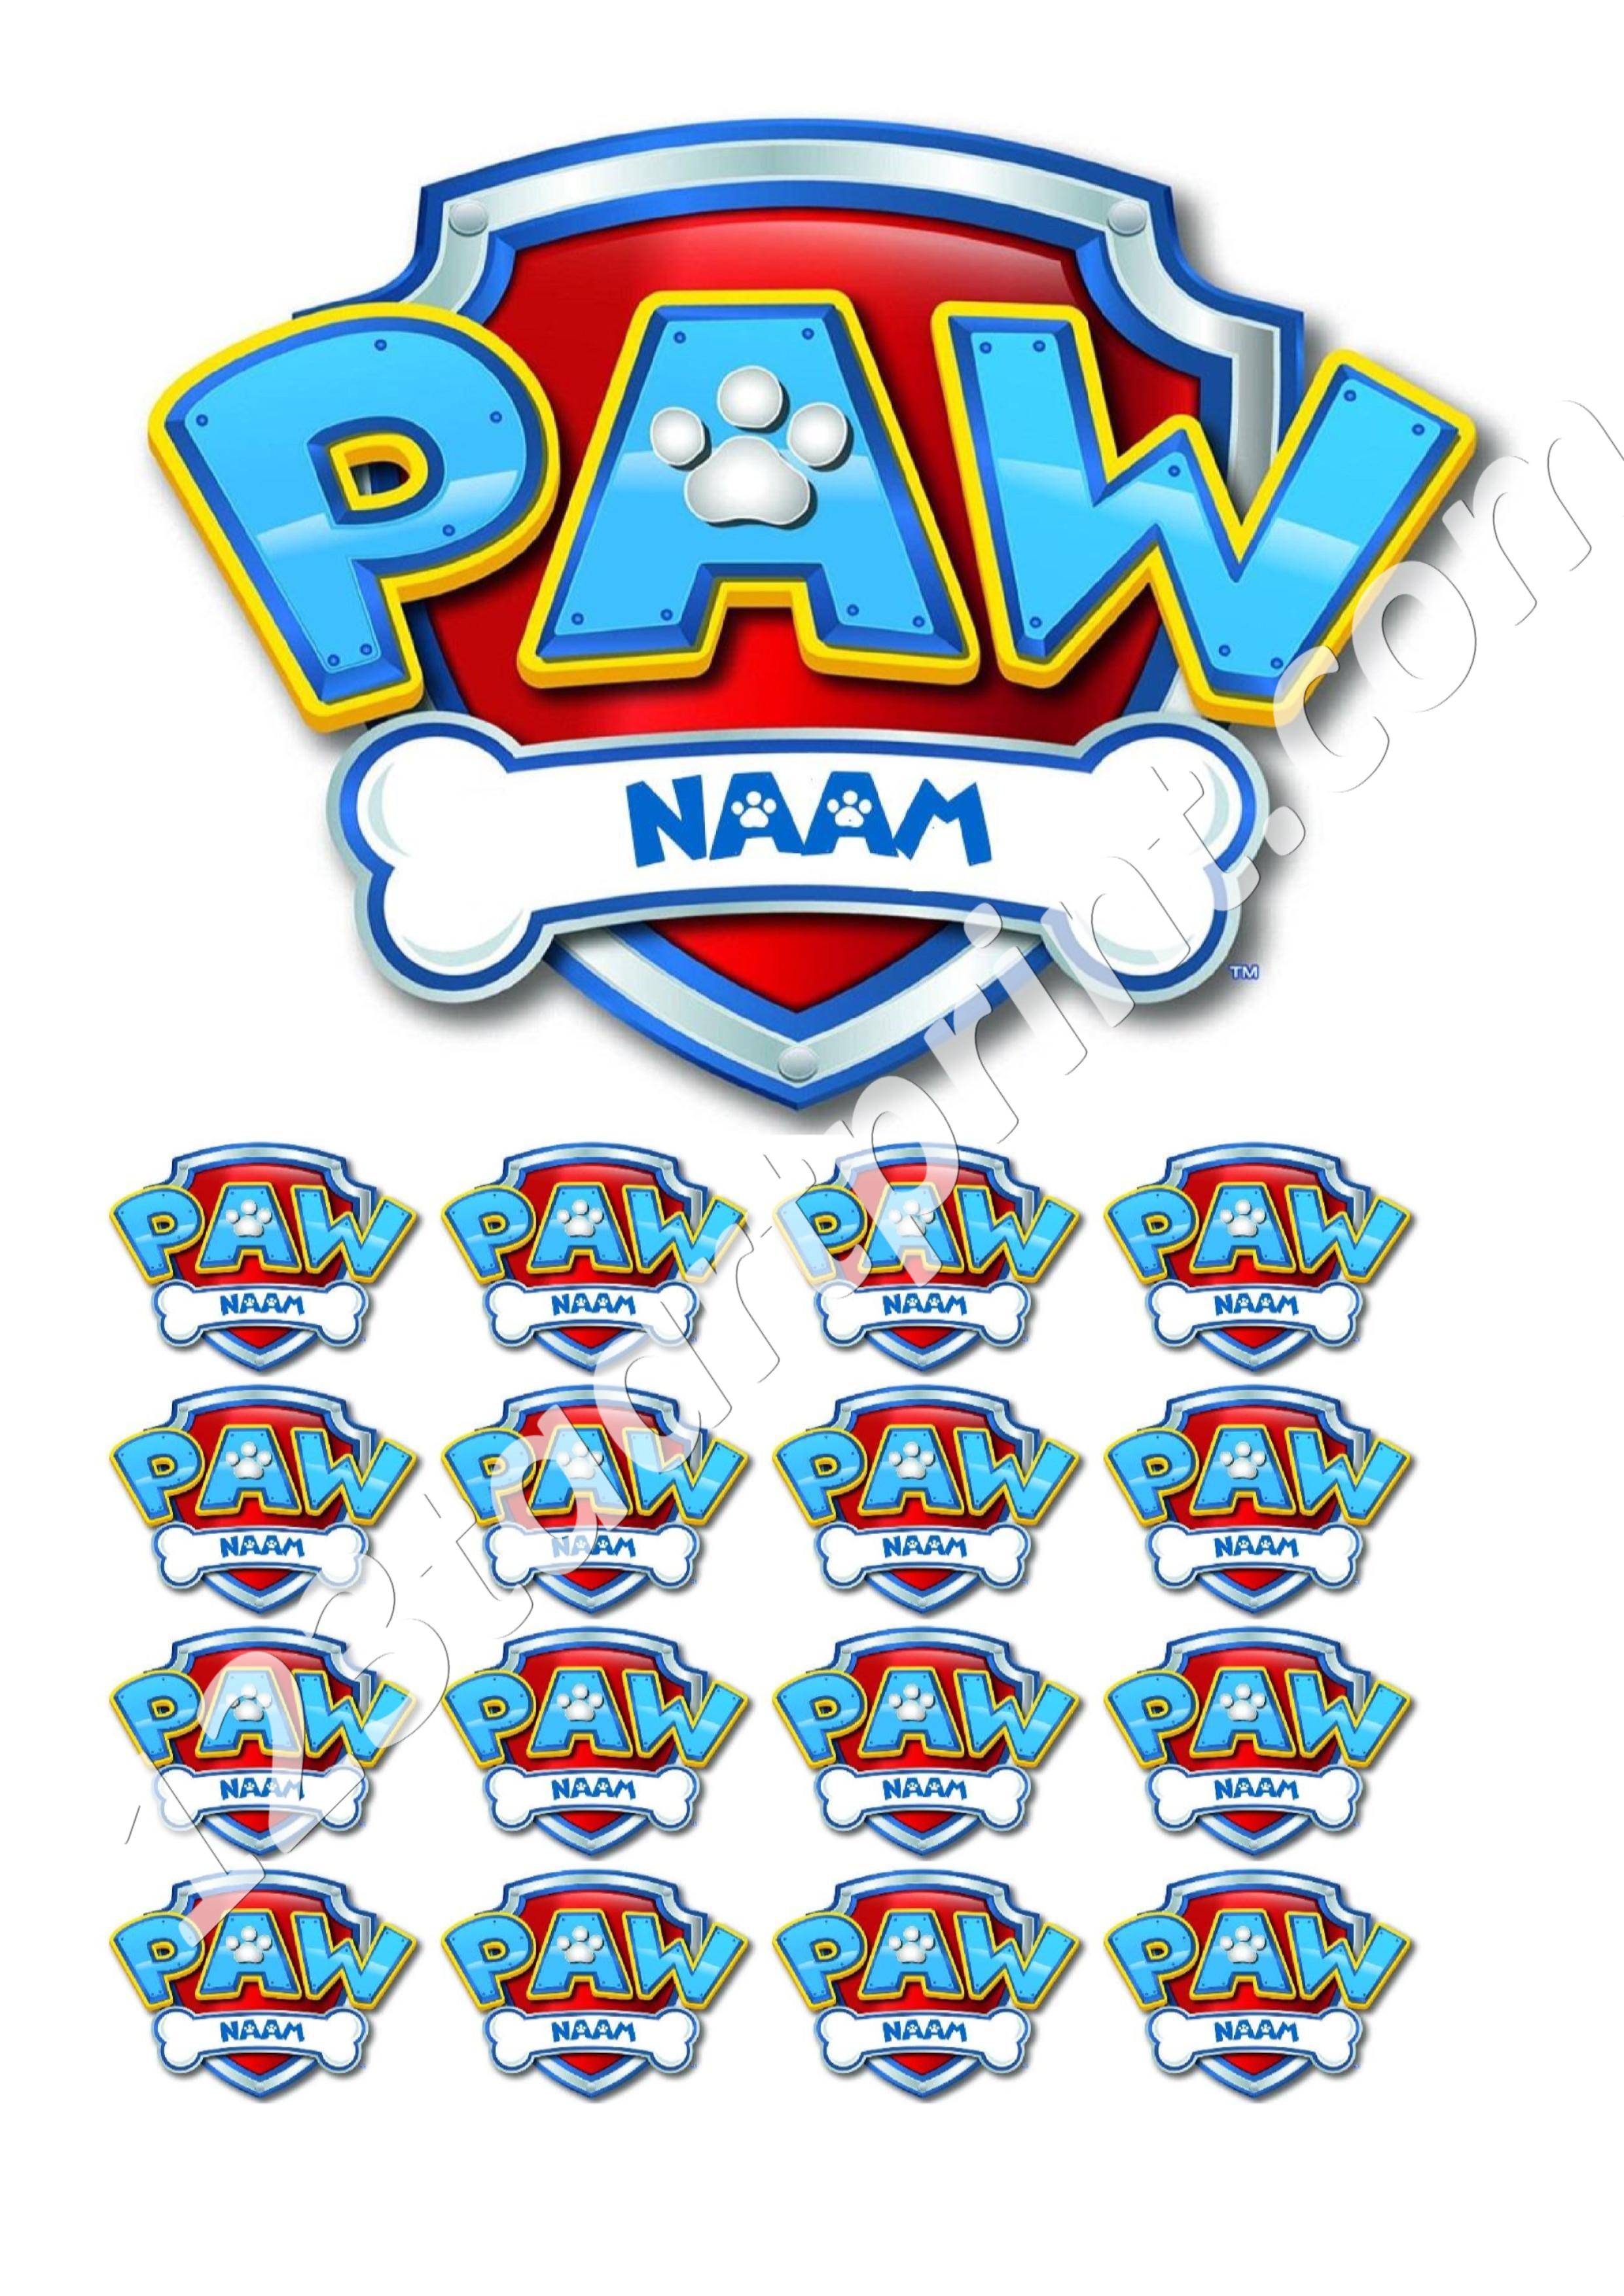 Paw Patrol logo met eigen naam